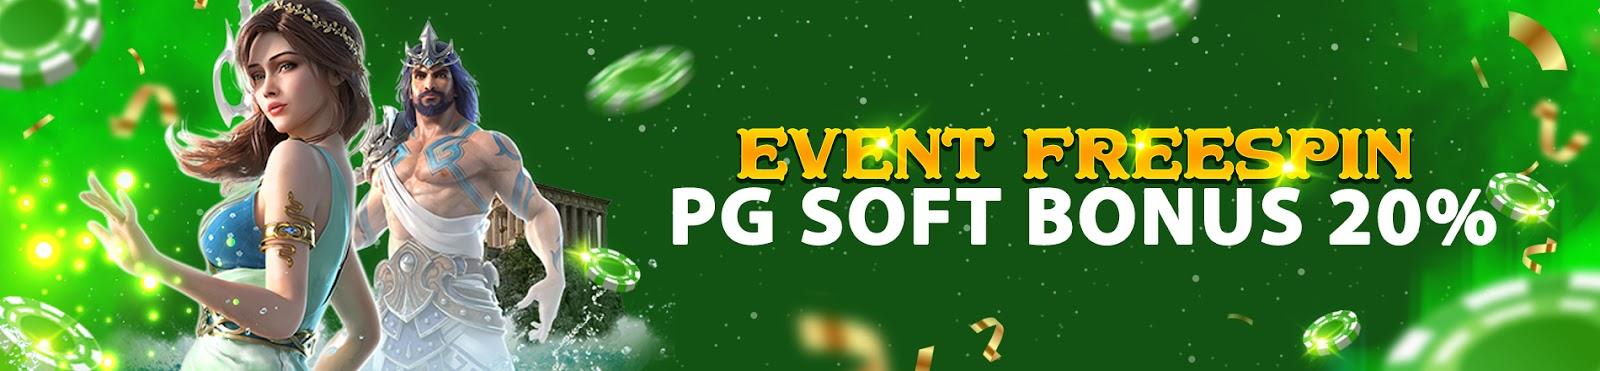 FREESPIN PG SOFT 20%